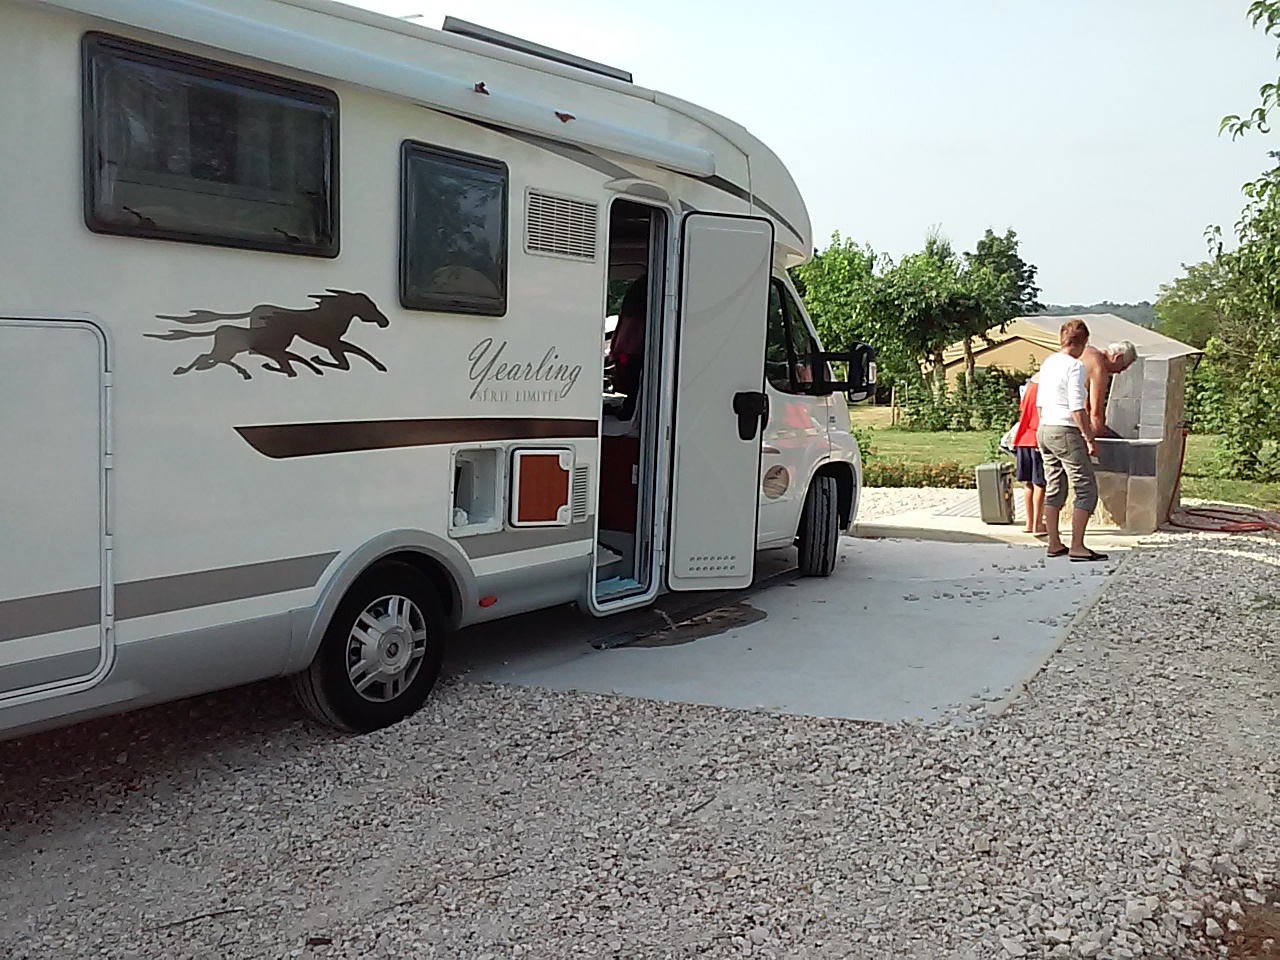 Camping Dordogne Avec Parc Aquatique Aire De Camping Car ... tout Camping Car De Luxe Avec Piscine